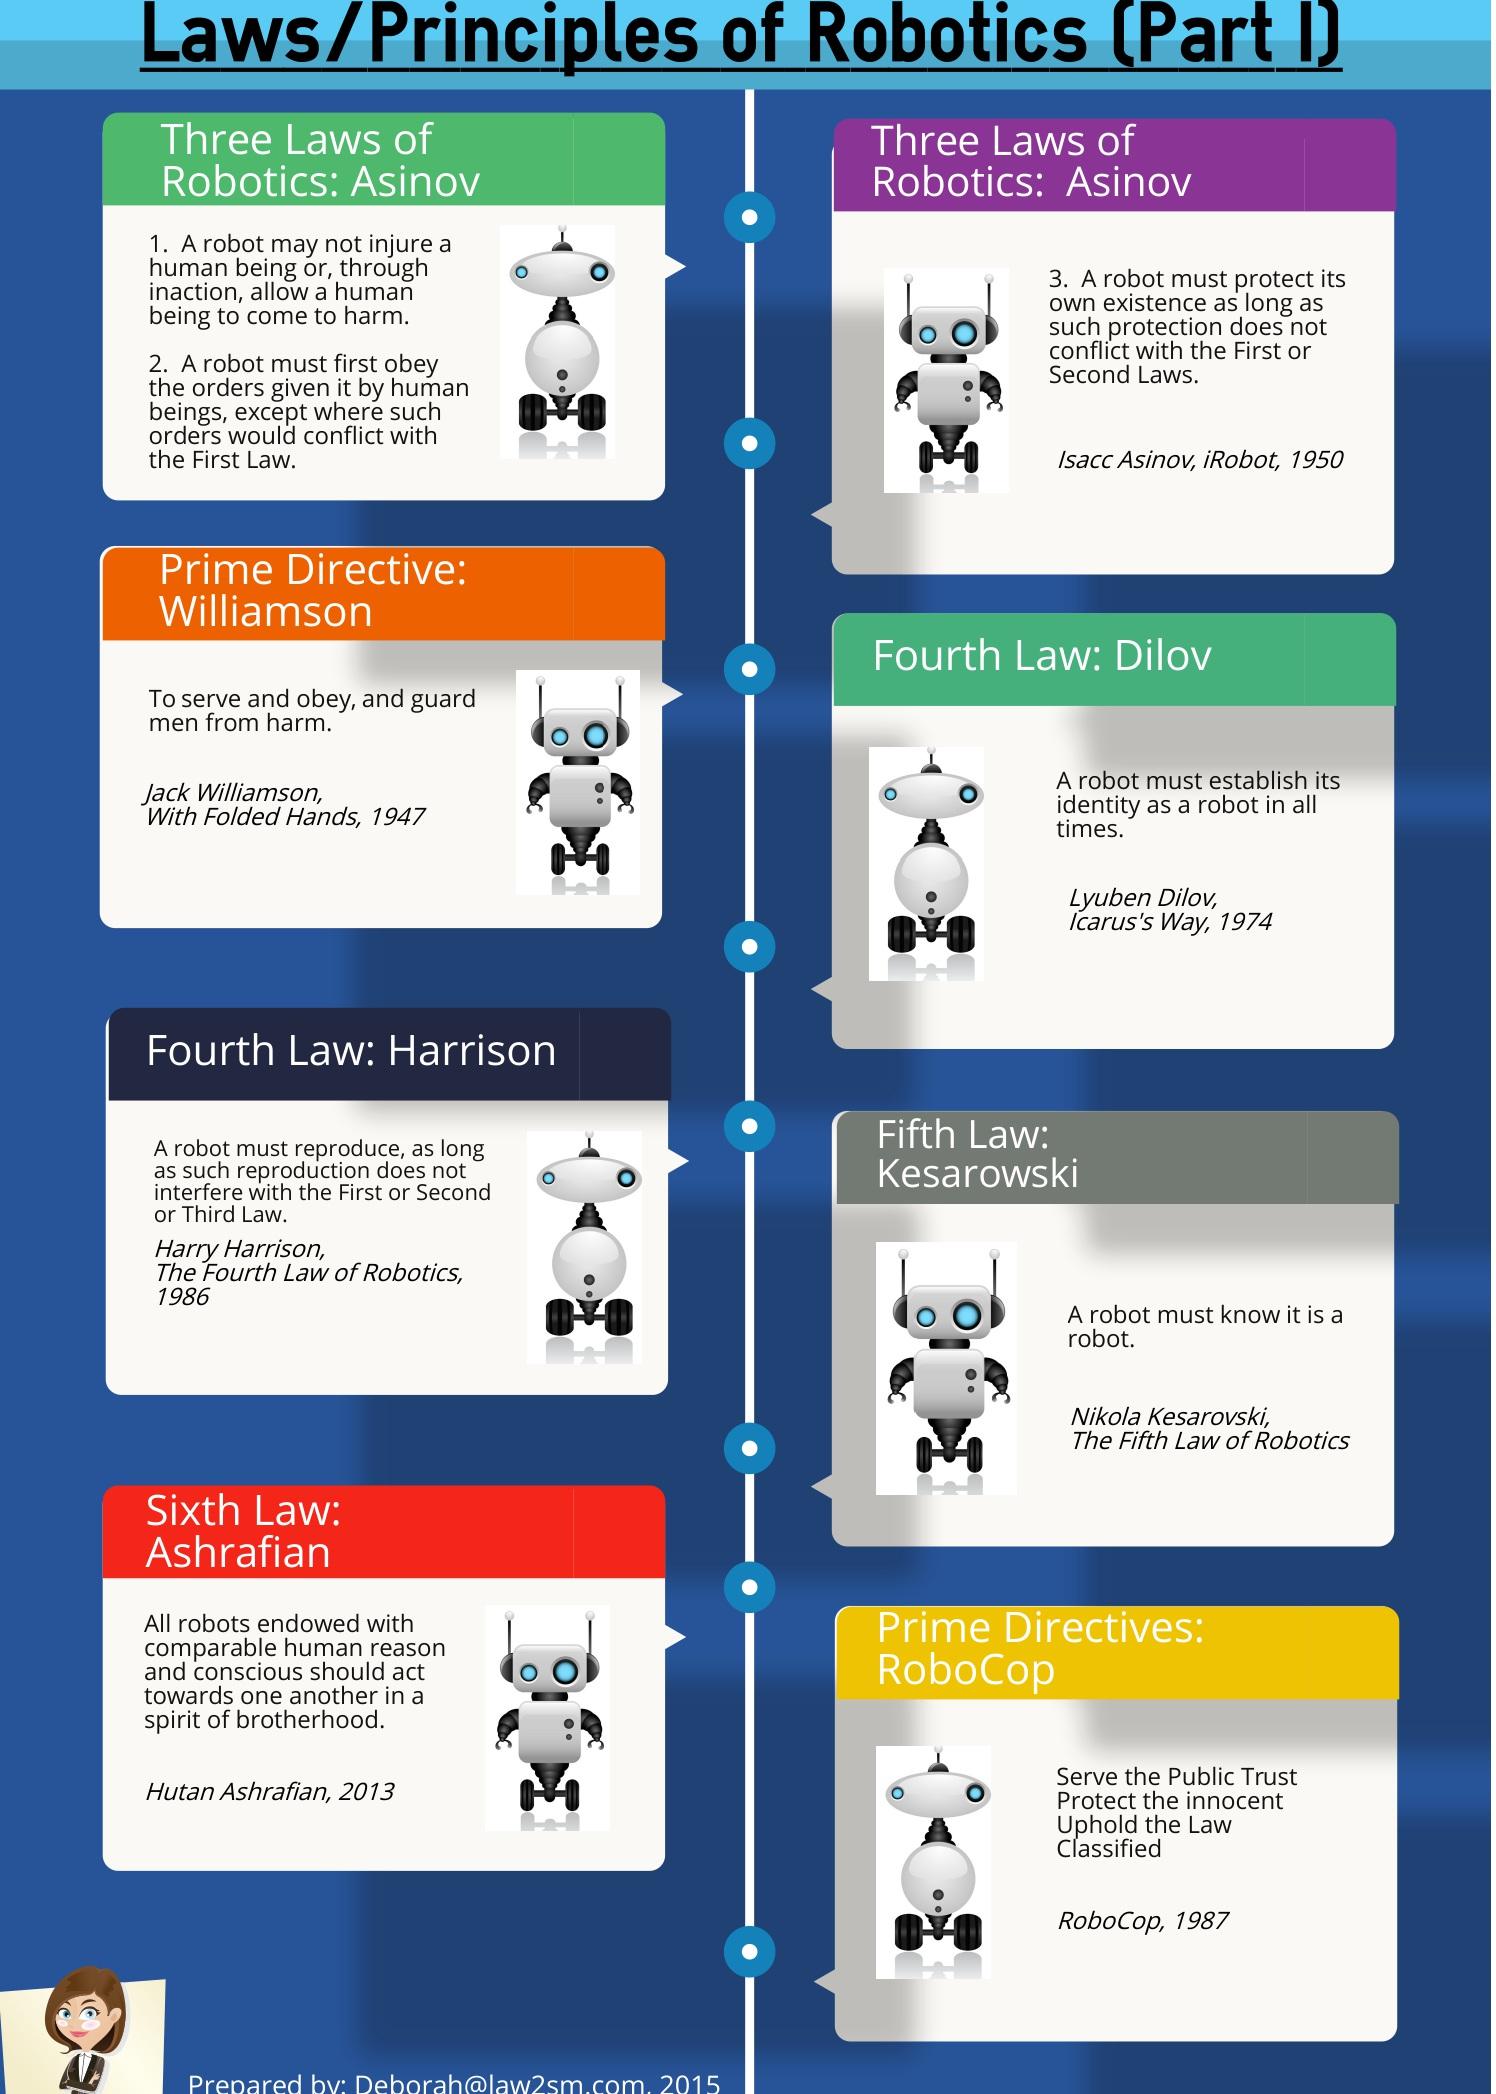 the fourth law of robotics